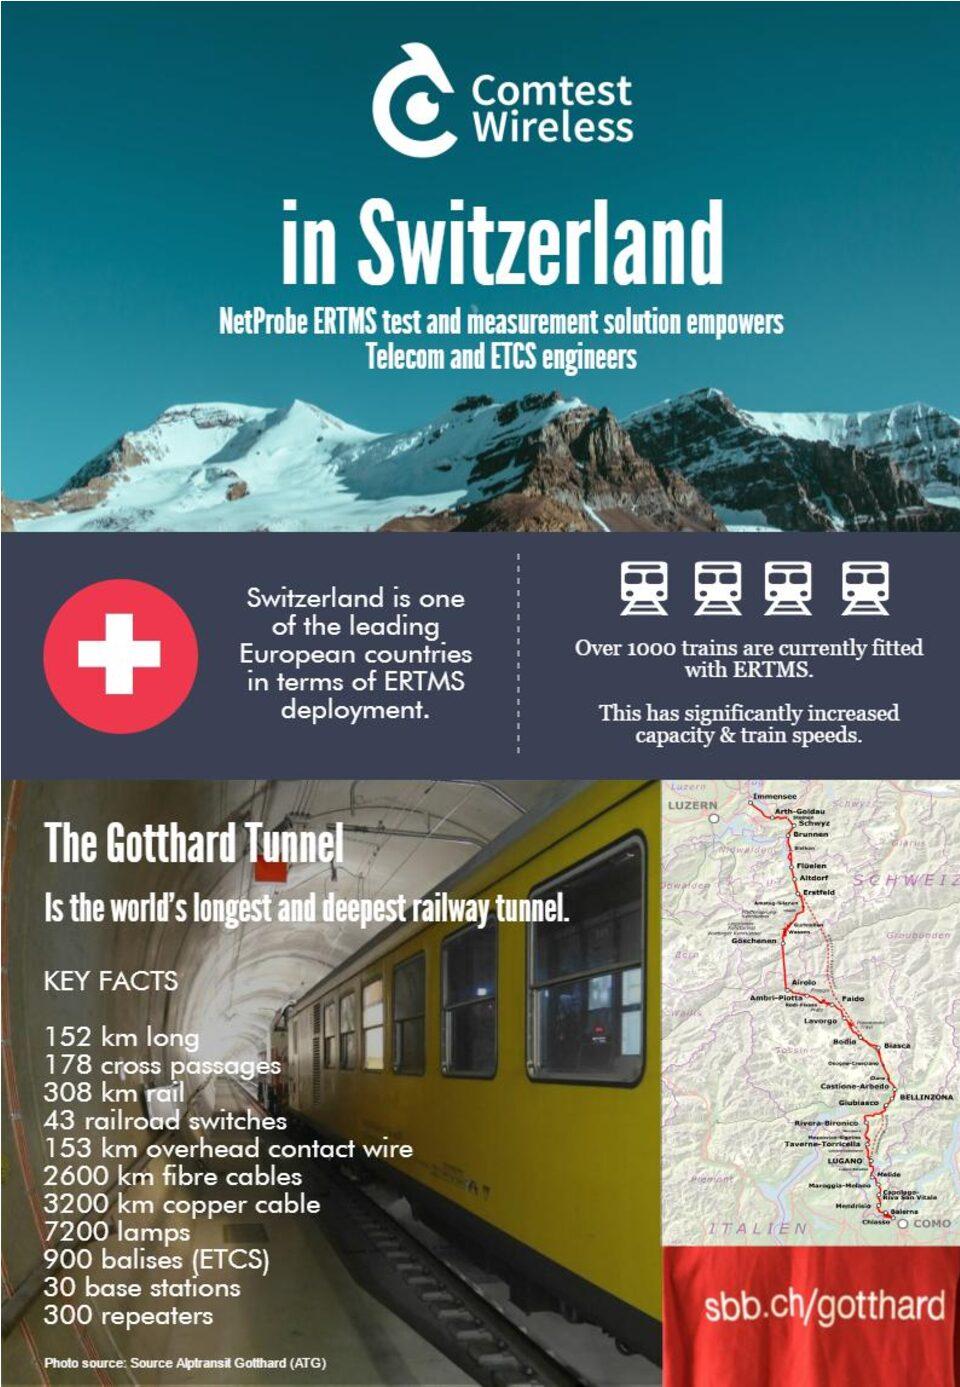 Comtest Wireless in Switzerland